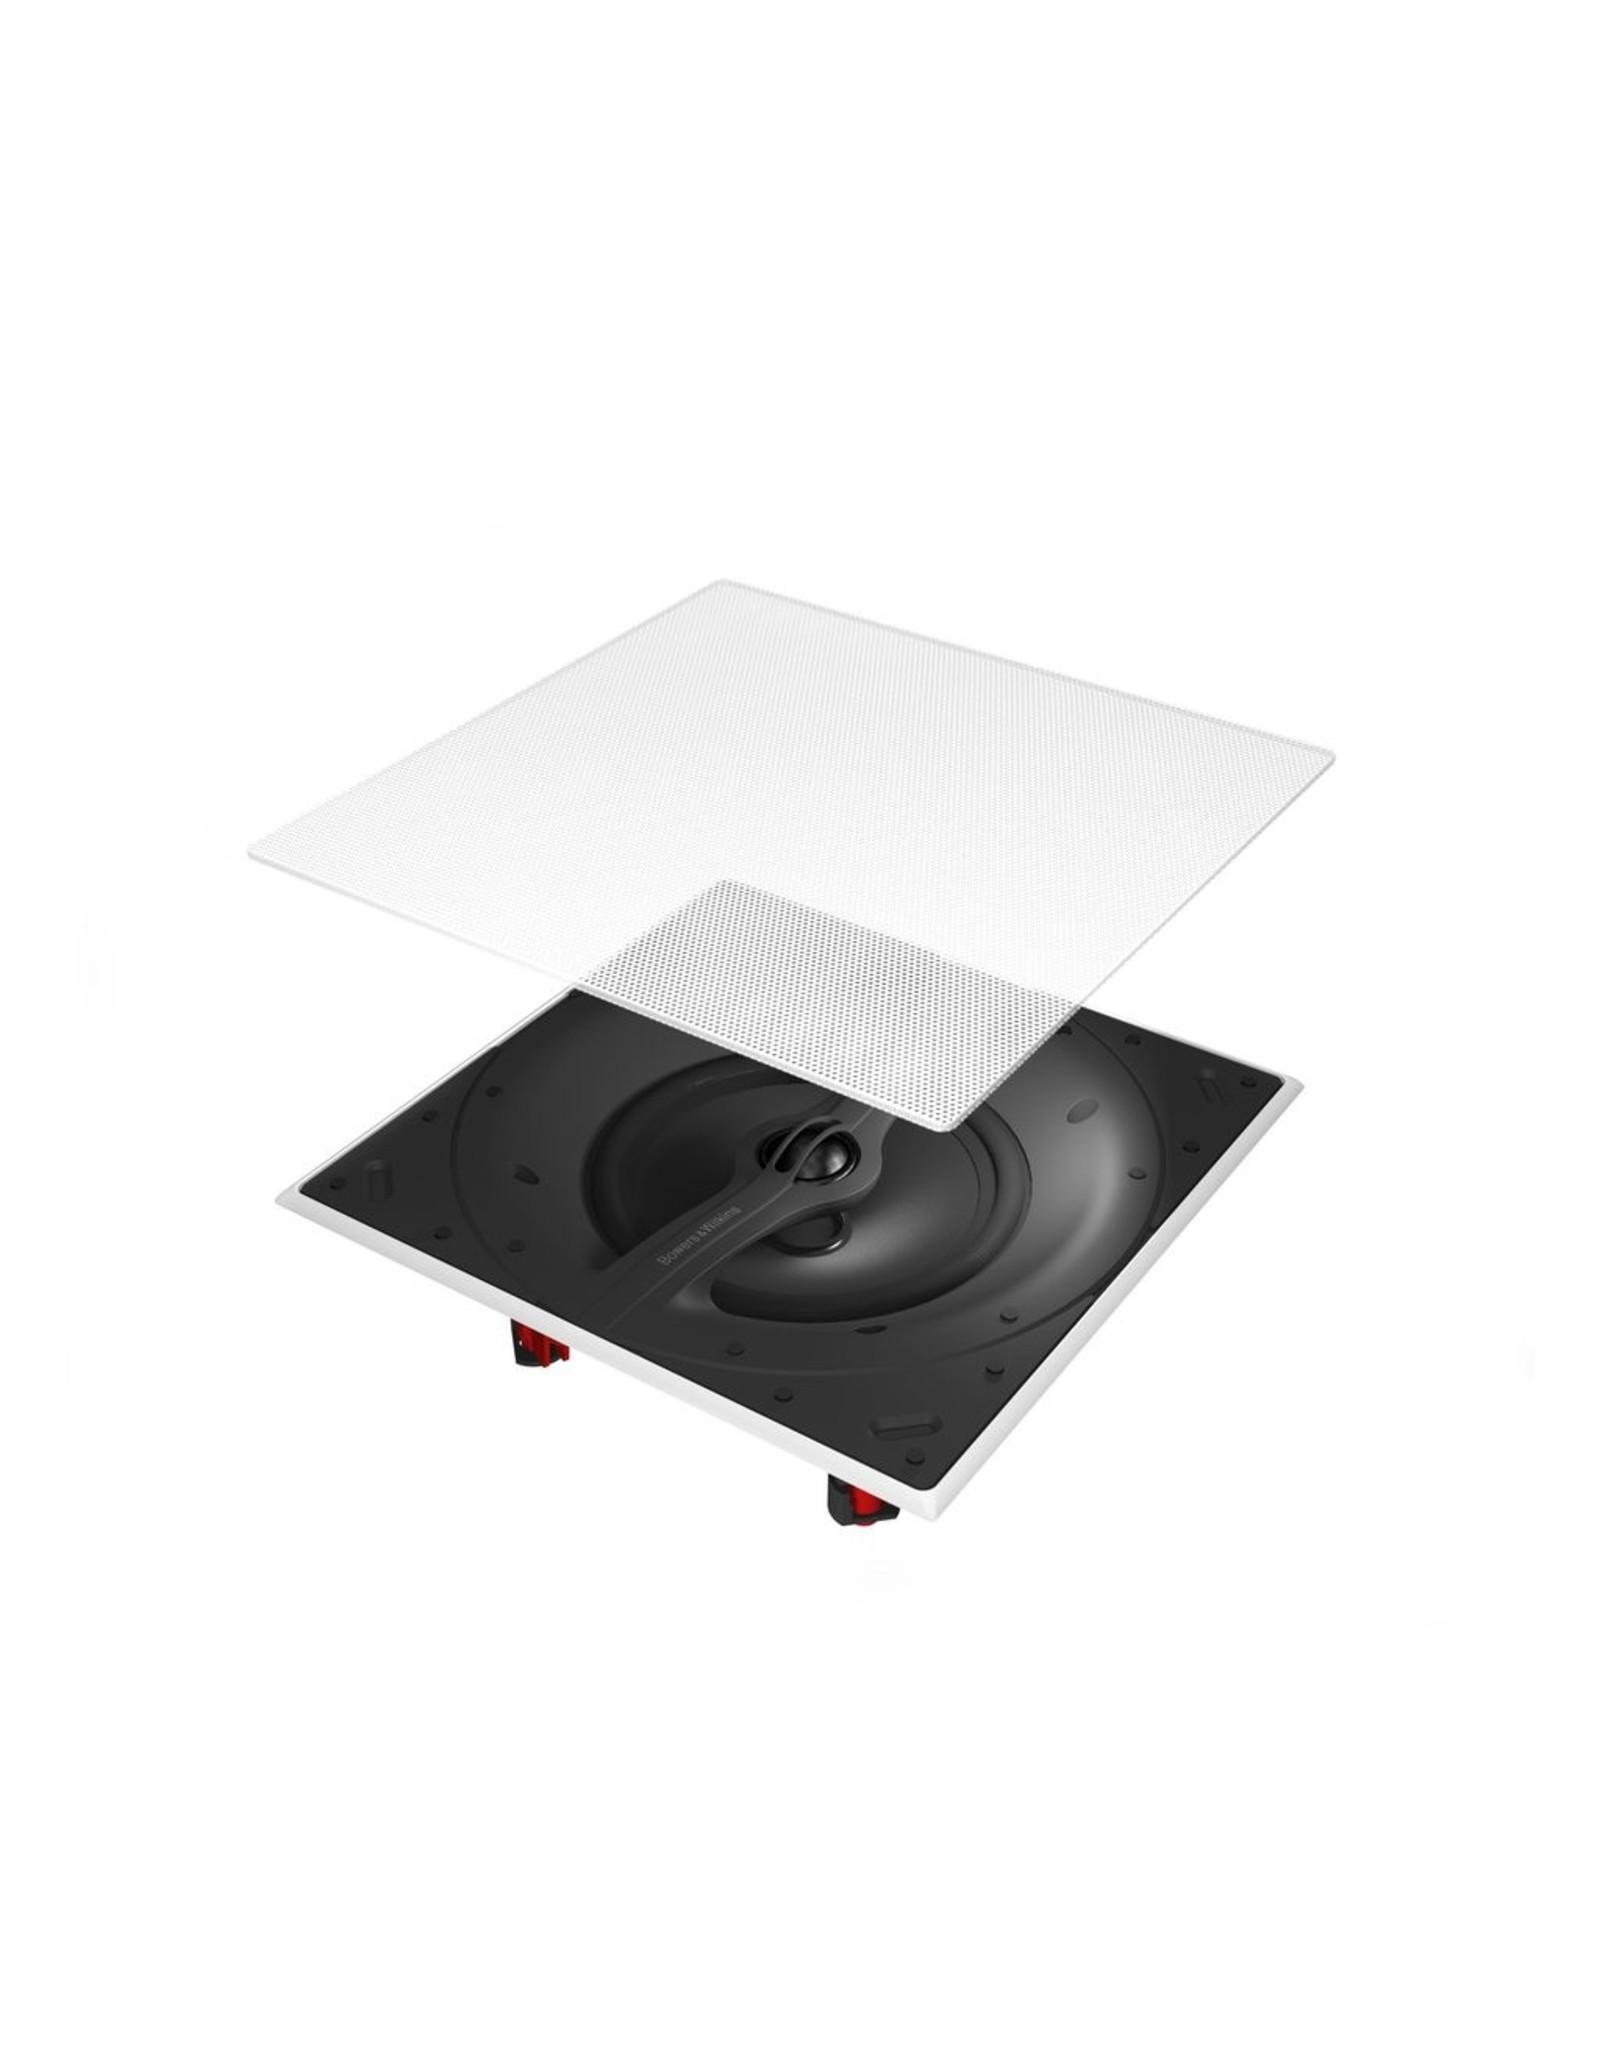 BOWERS & WILKINS B&W CCM362 In Ceiling Speakers (pair) WHITE